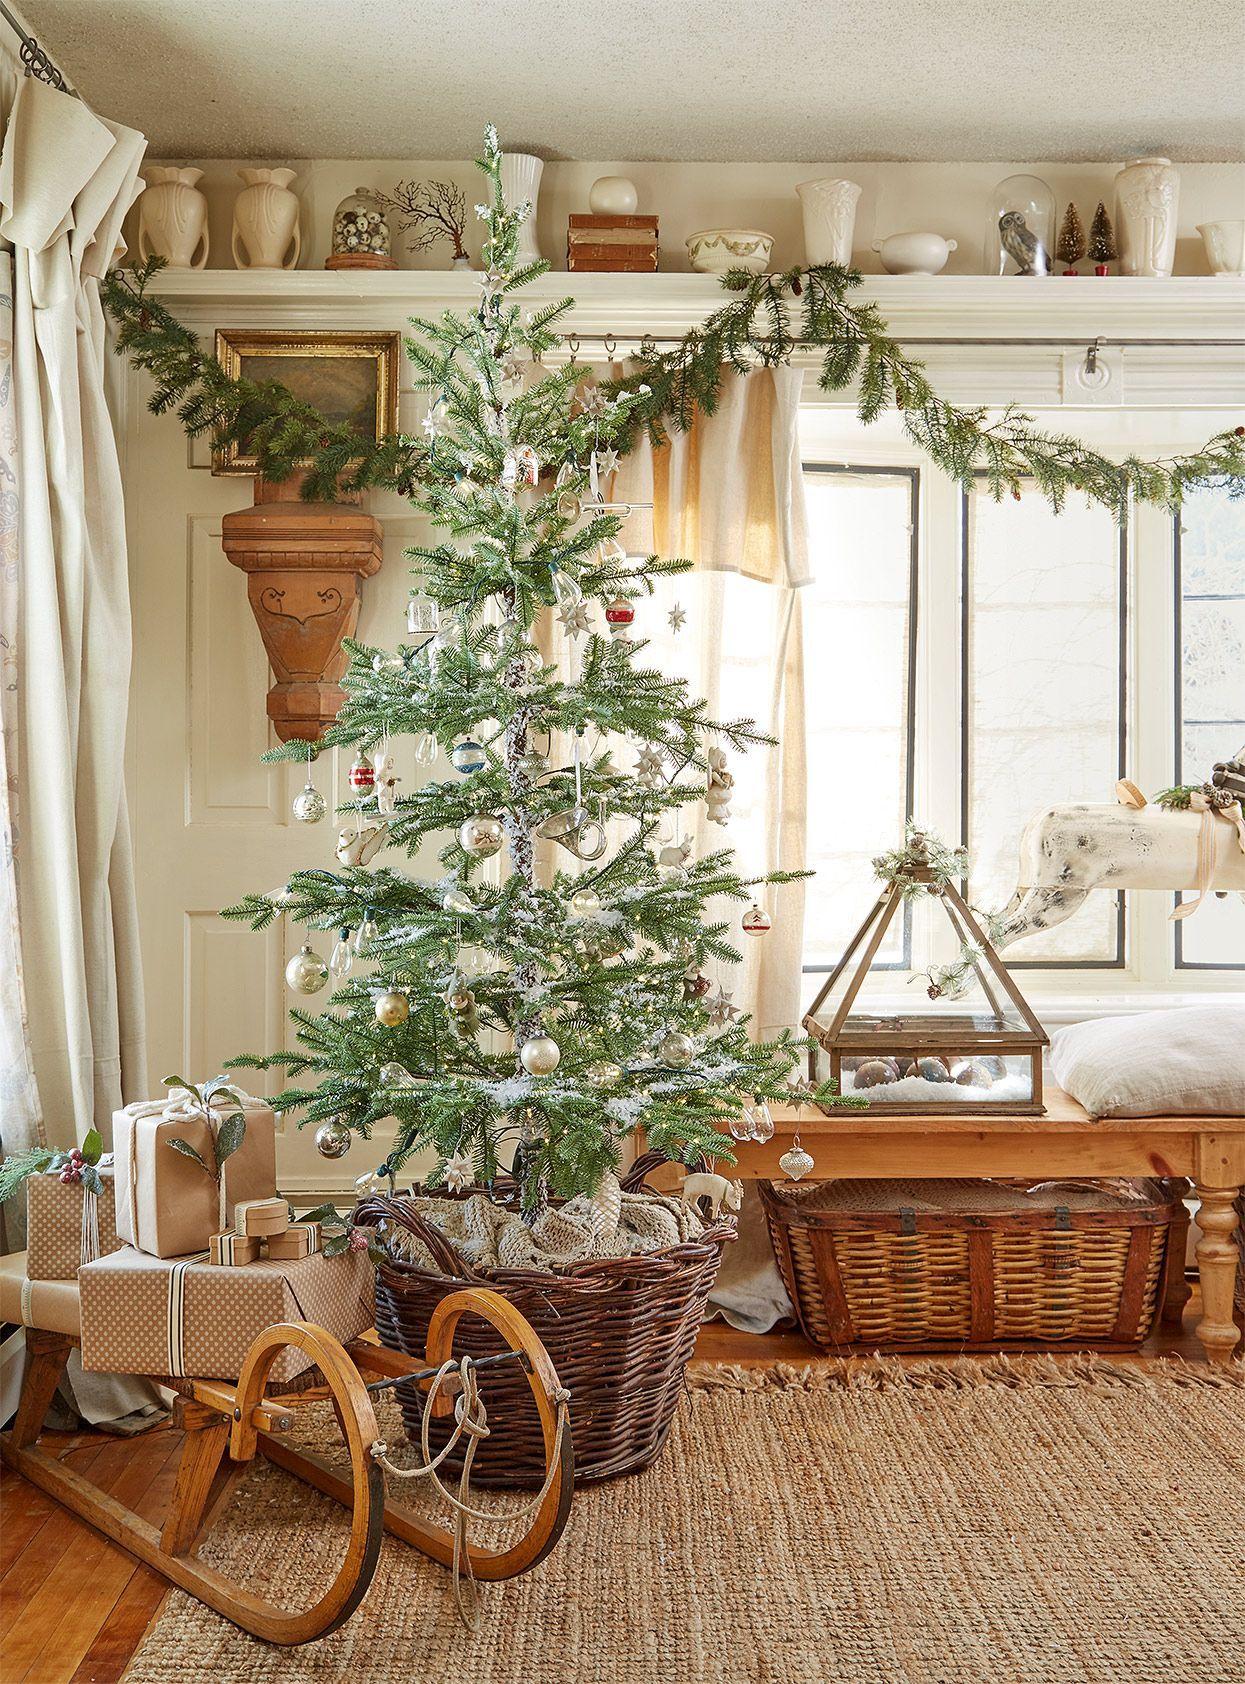 19 Farmhouse Christmas Decor Ideas to Make Your Space More Festive#christmas #decor #farmhouse #festive #ideas #space